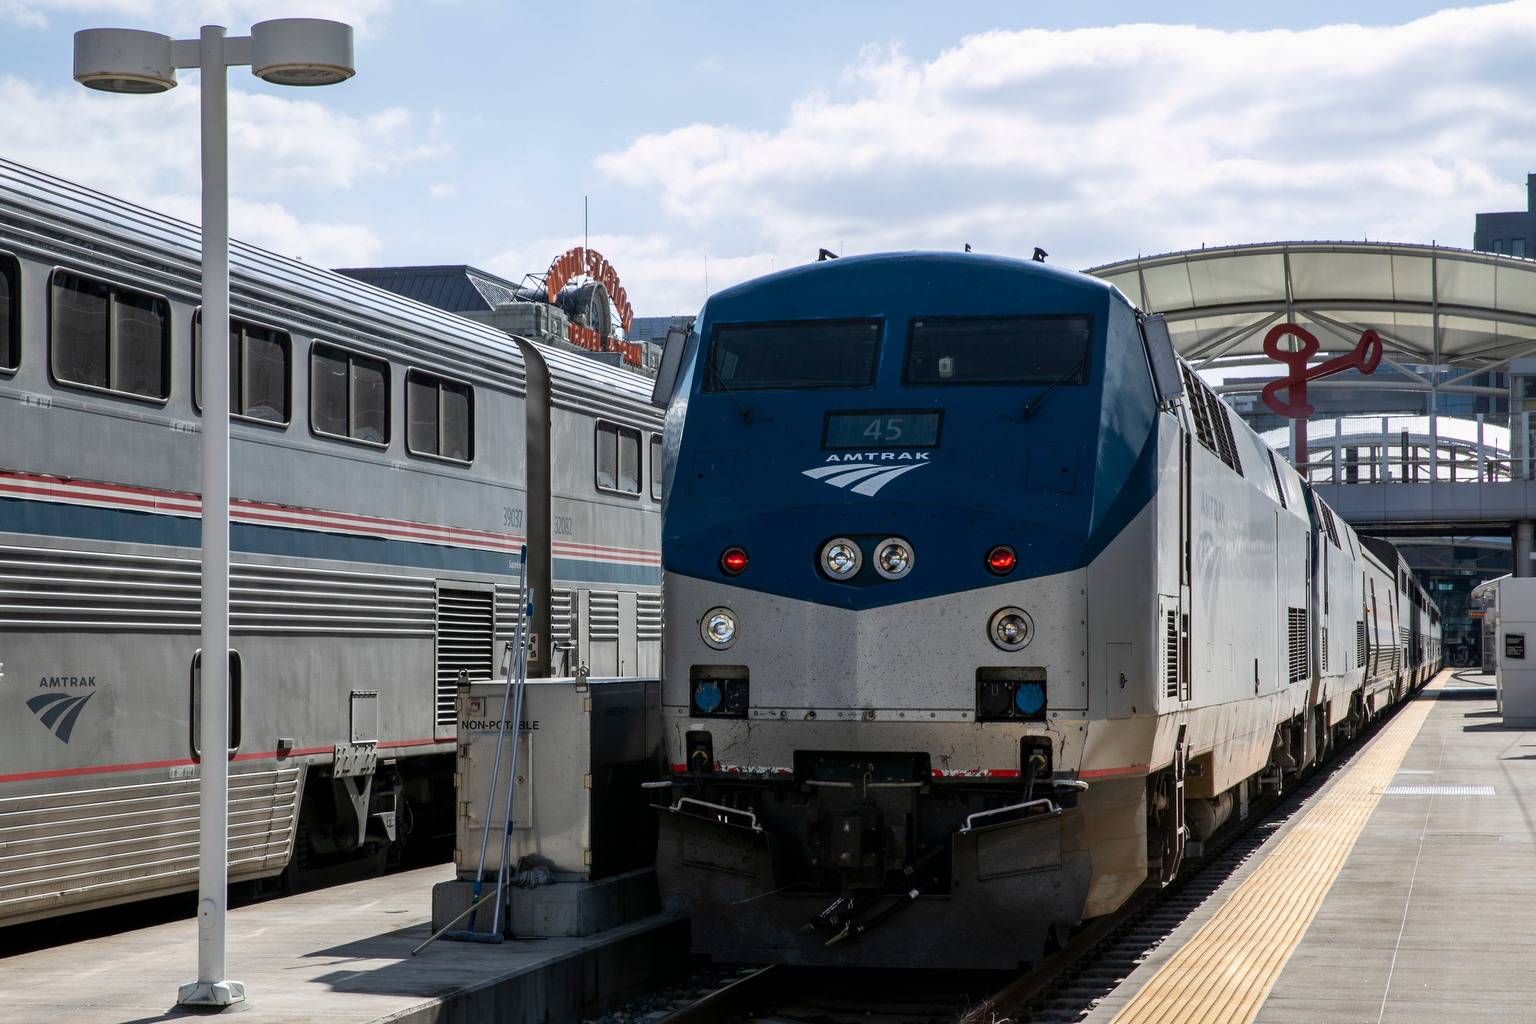 Amtrak trains at Union Staton in Denver.